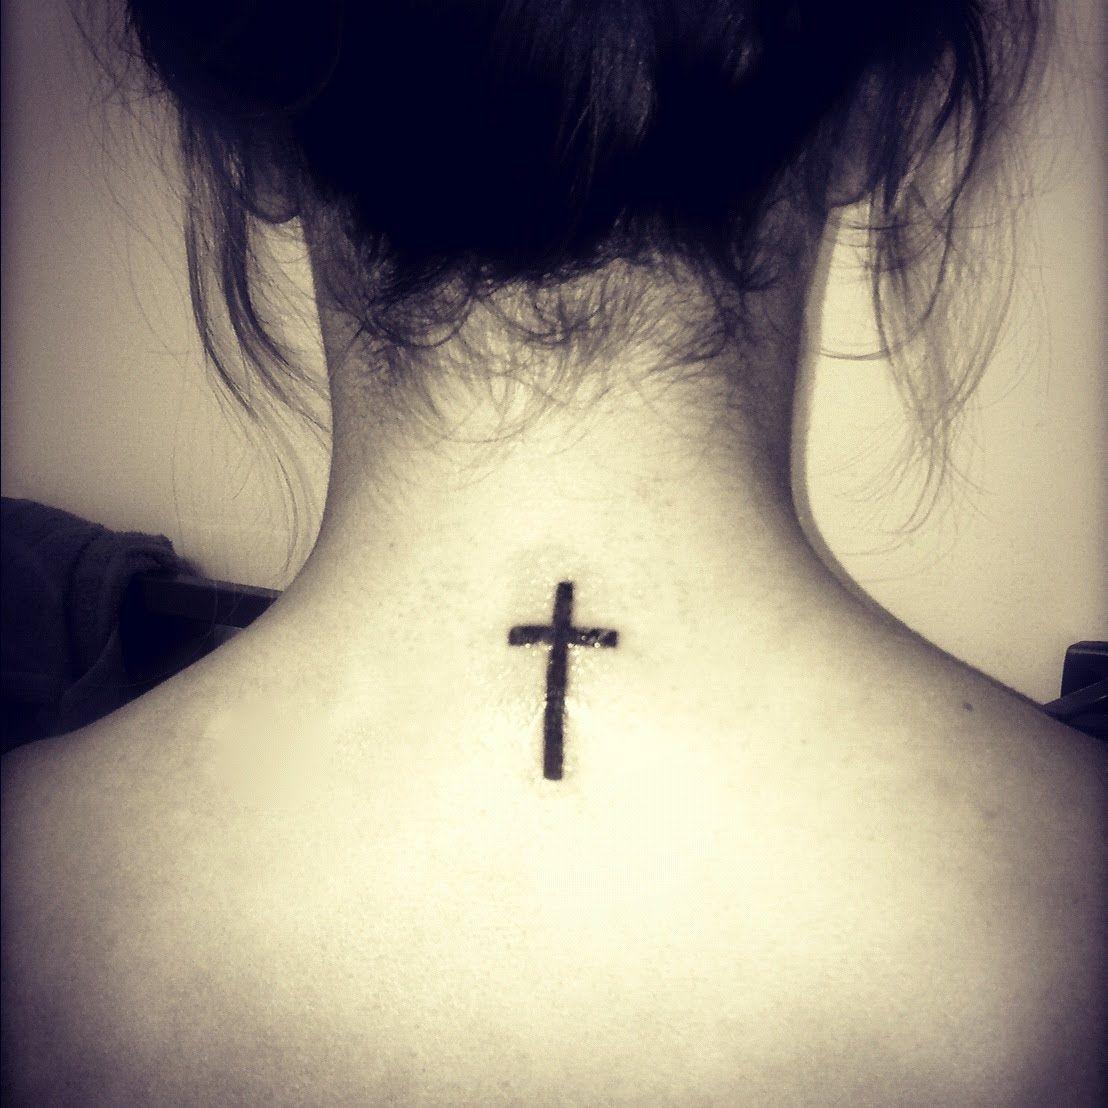 Cross Tattoo on Back | Tattoos & Piercings | Pinterest ...